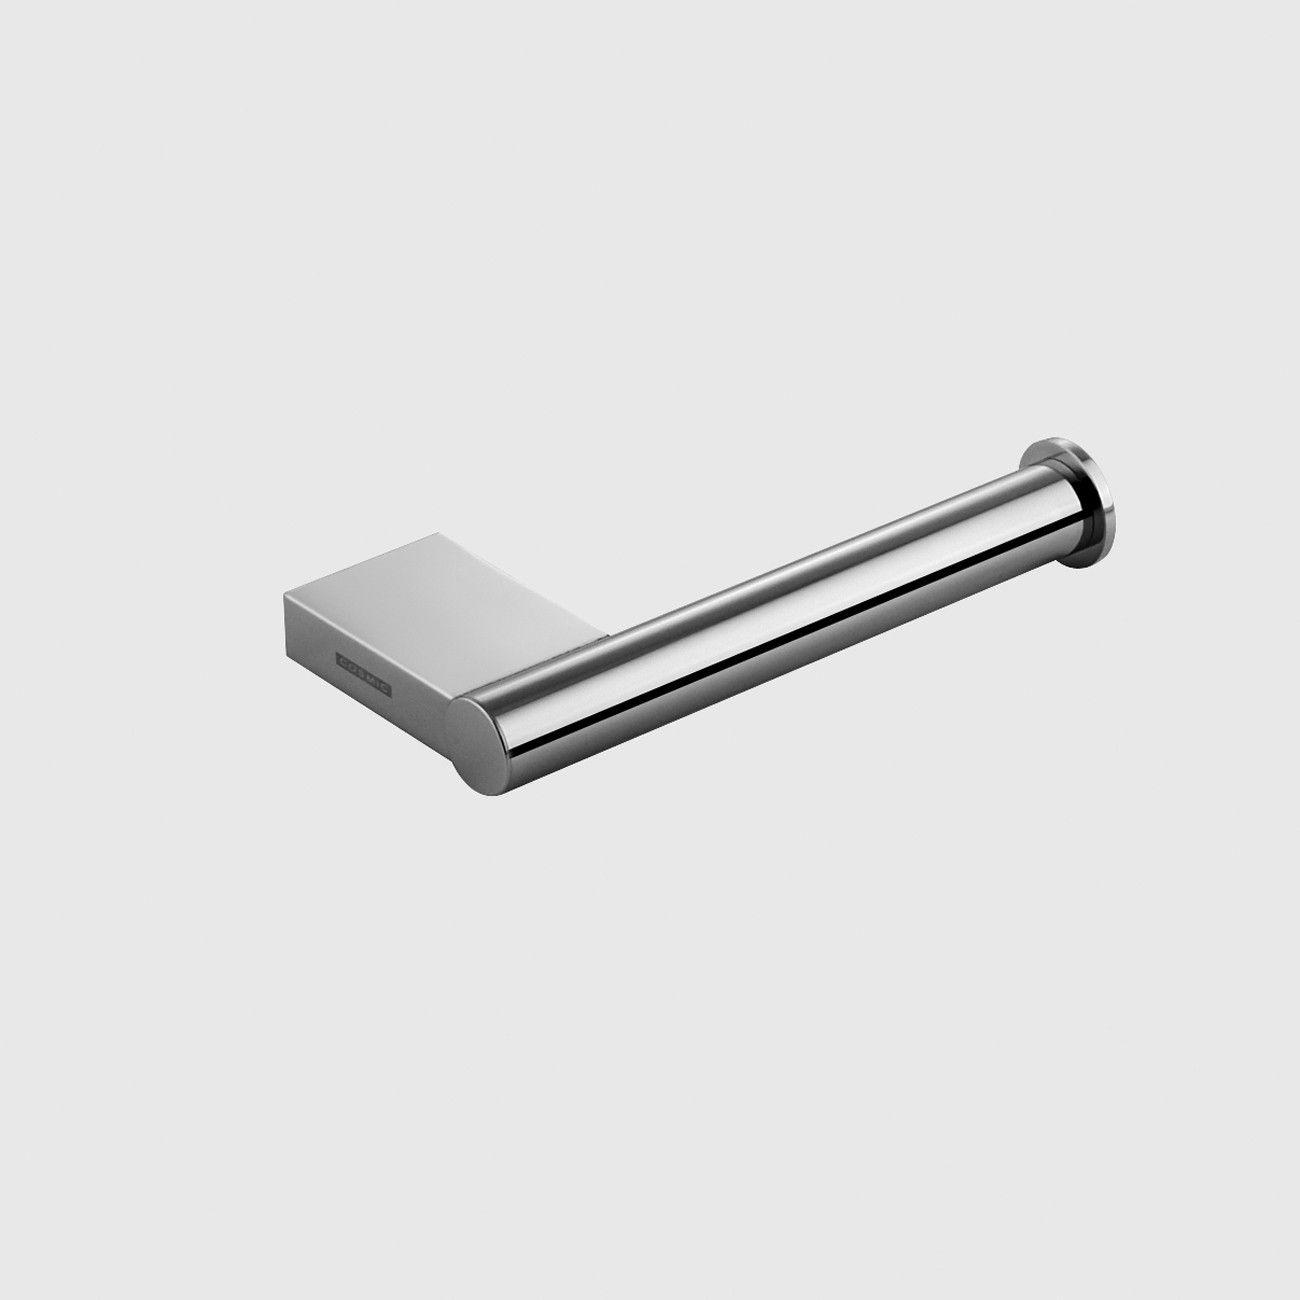 Cosmic Project Paper Holder Designer Bathroom Accessories